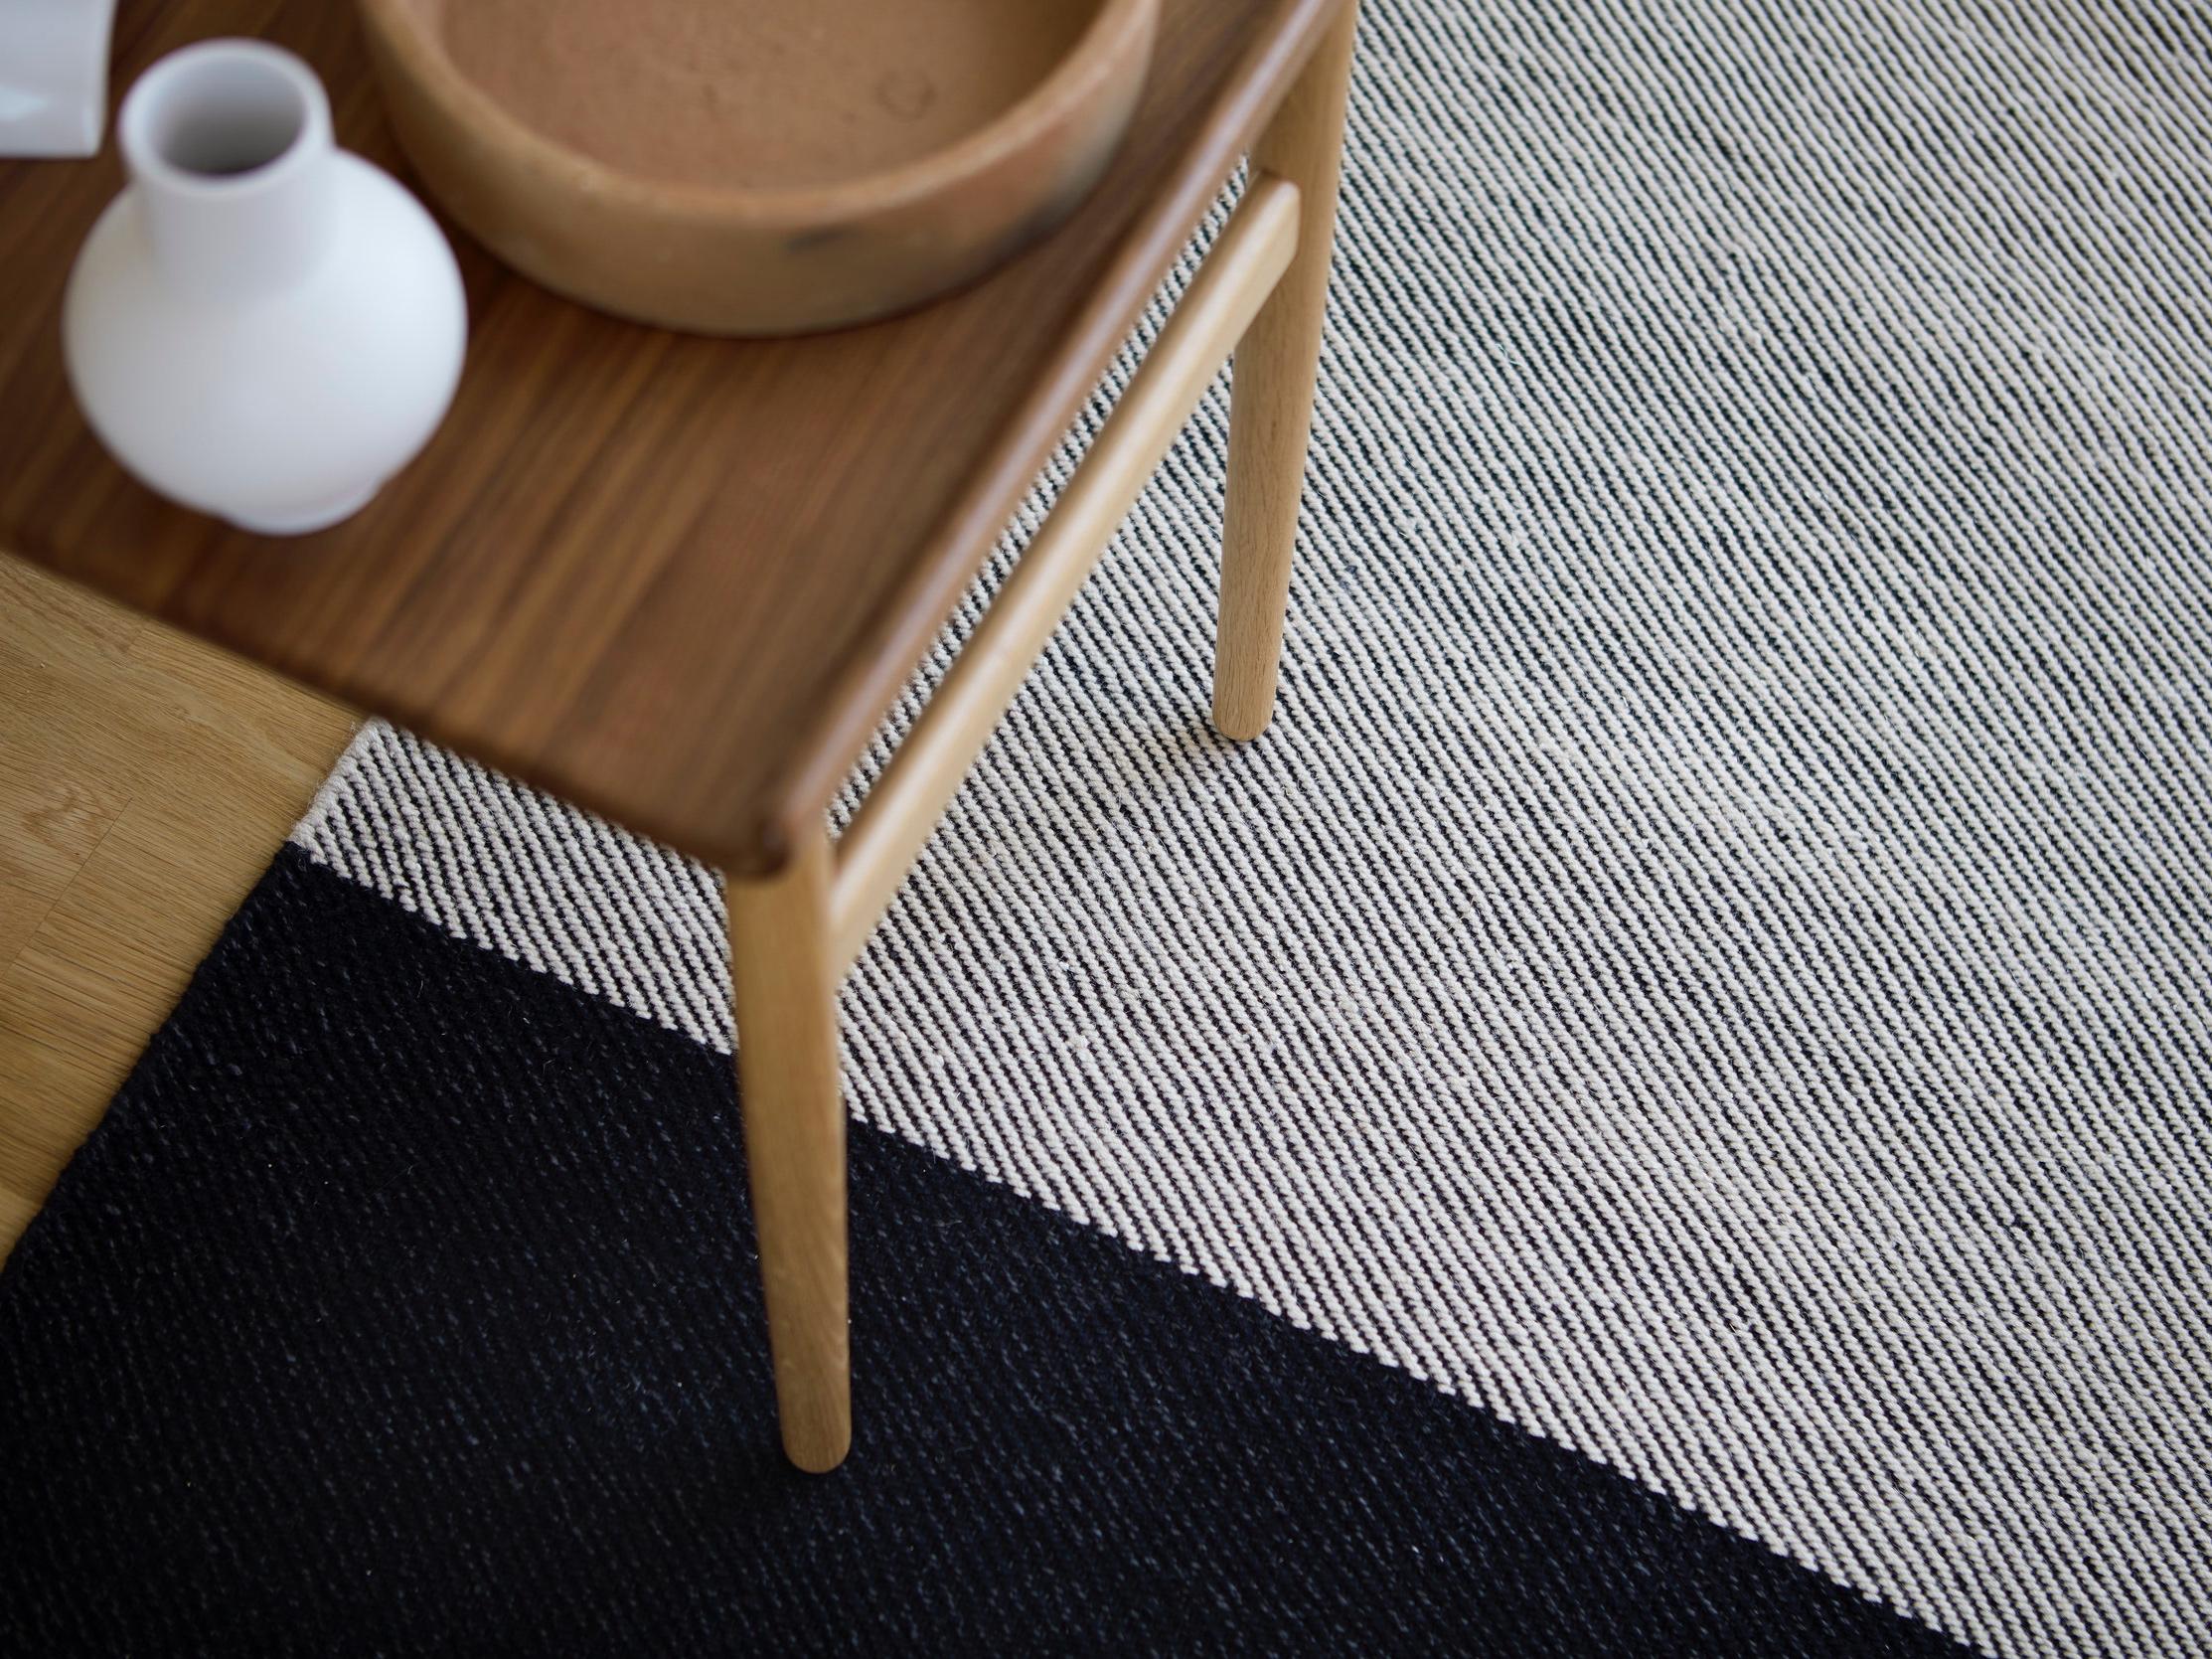 Fabula_Primula_Rug_Black_Offwhite_Wool_Linen_Hand-woven_1511_A2_Medium.jpg